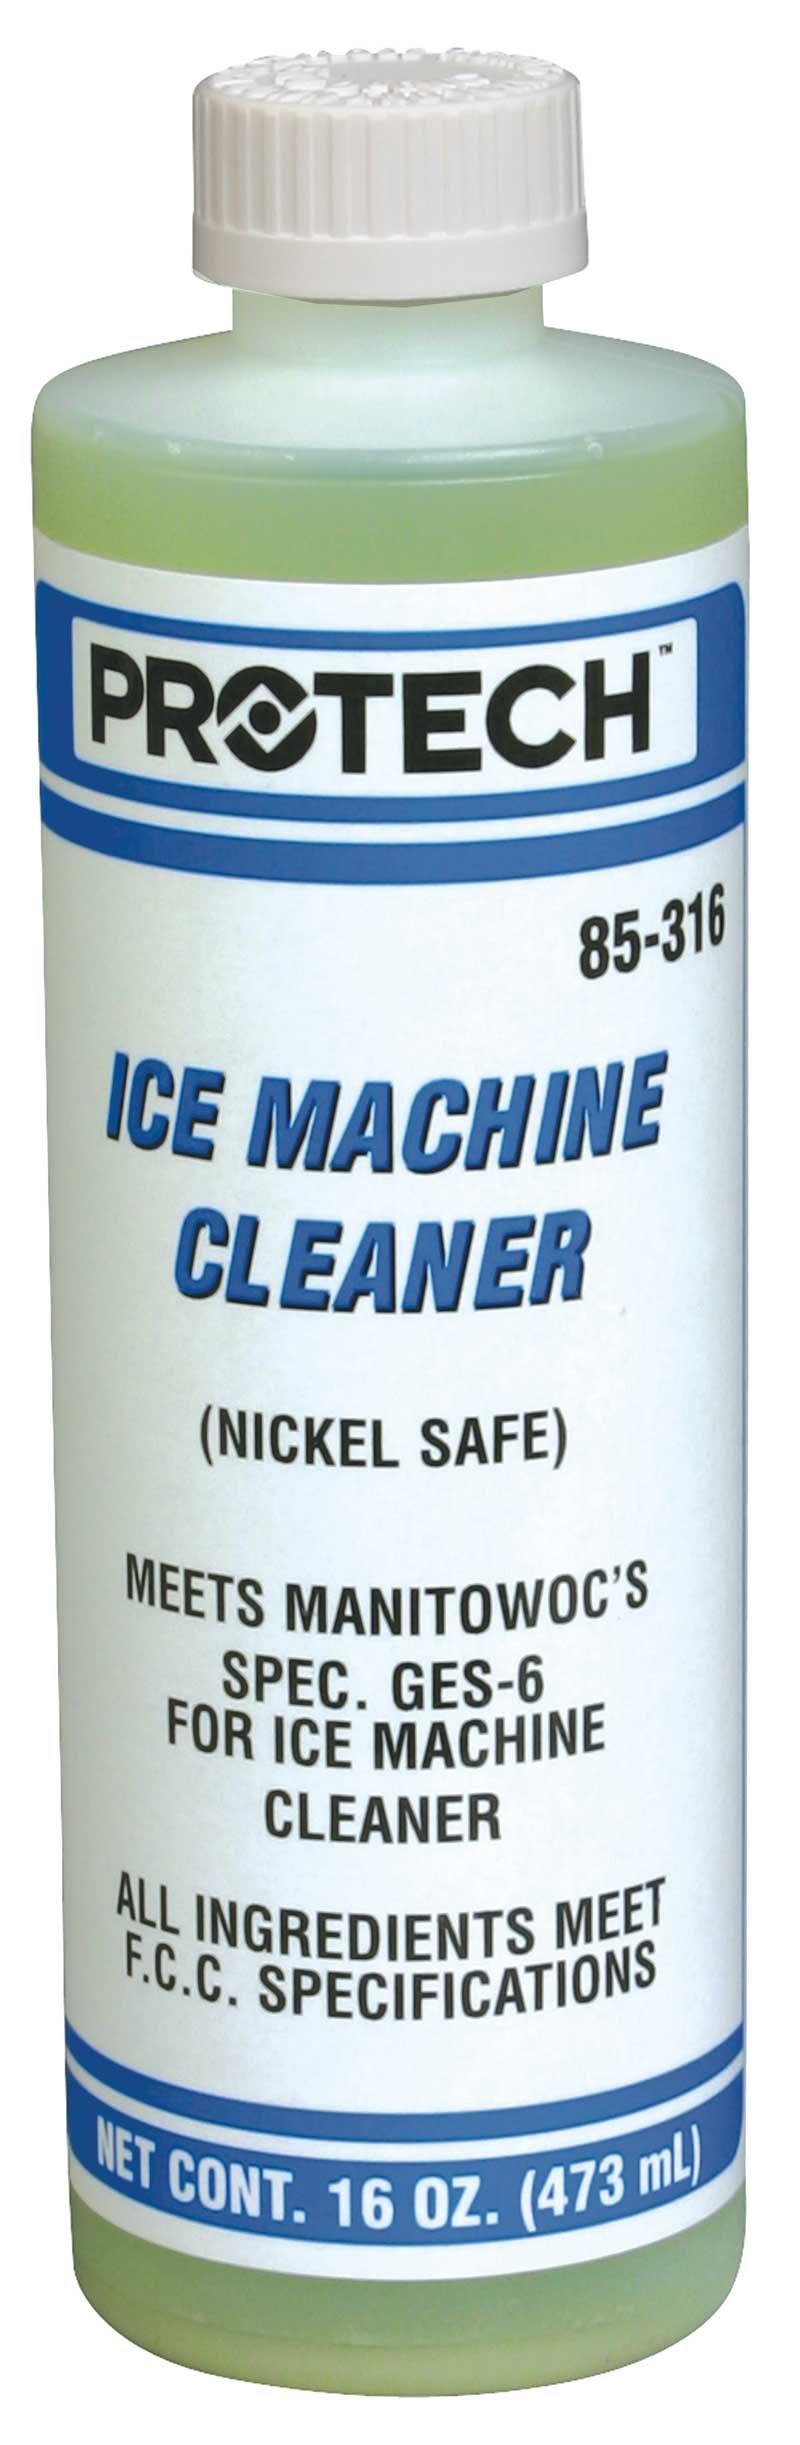 Rheem Ice Machine Cleaner Bottle - 16 oz. #85-316 (pack of 12 items)